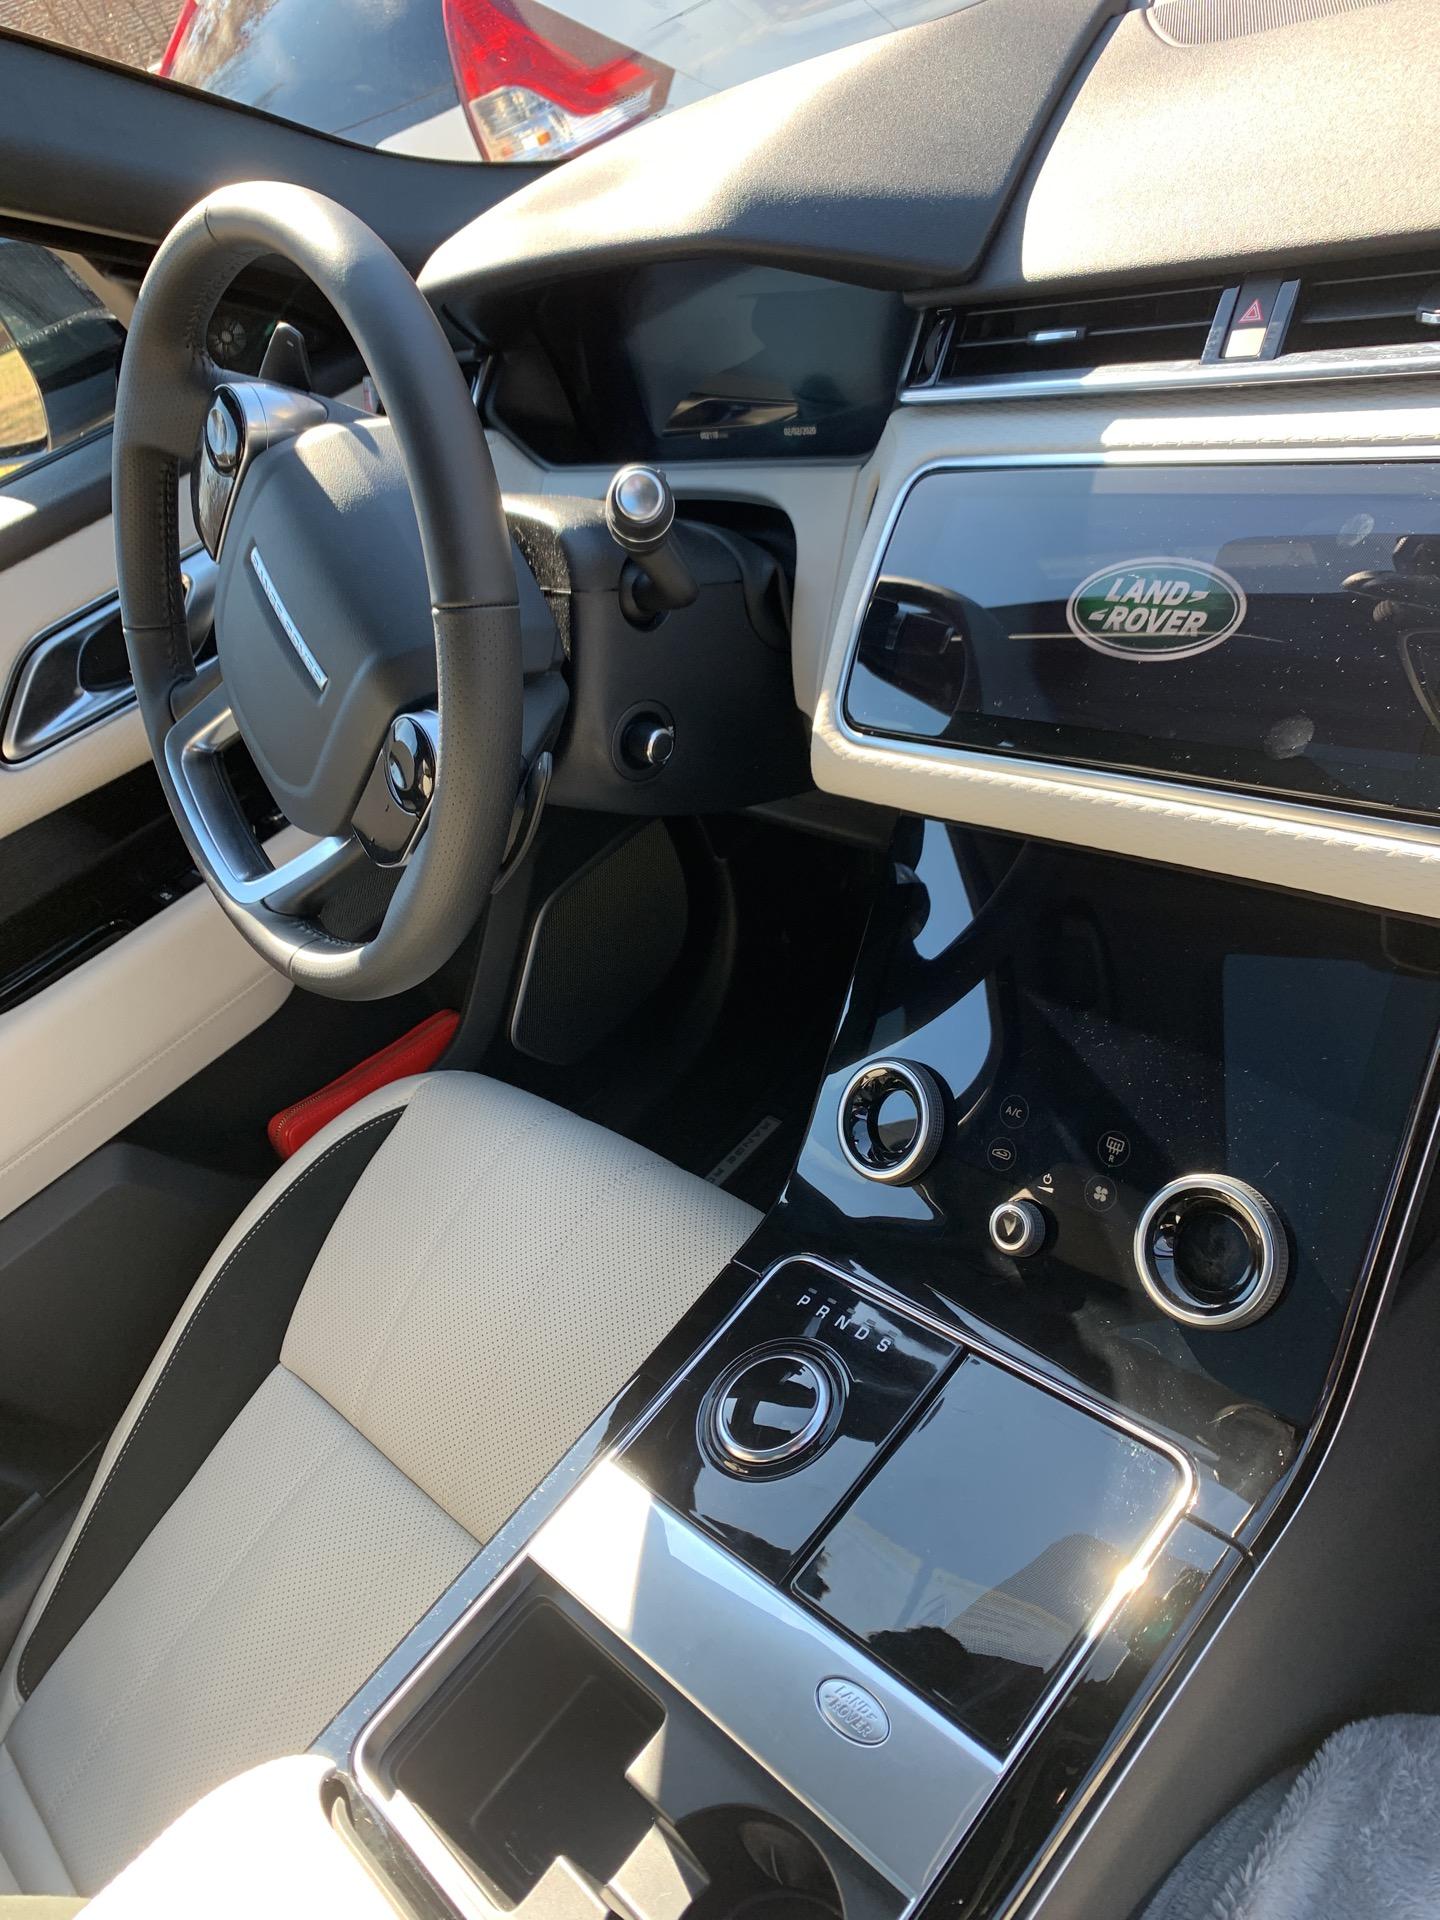 2020 Land Rover Range Rover Velar - photo 3